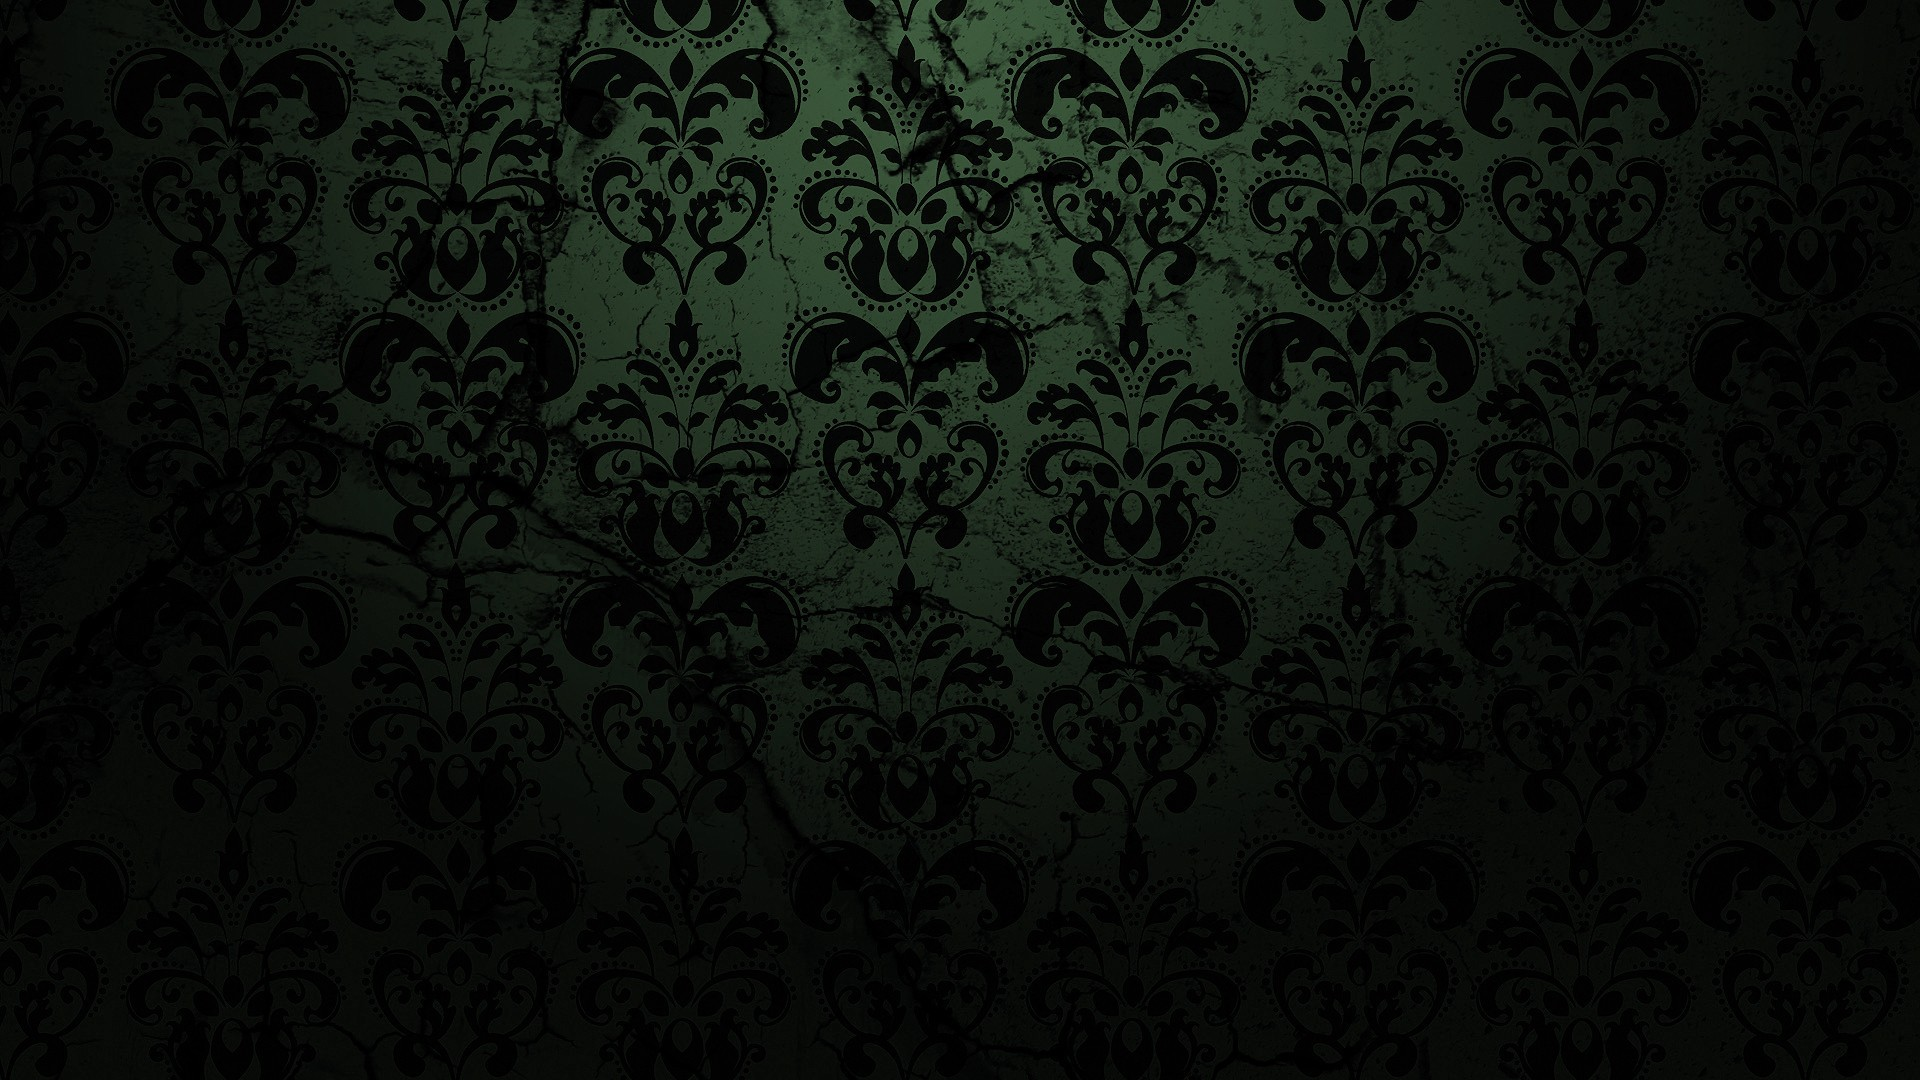 vintage desktop wallpapers page 2 vintage wall pattern 1920x1080 1920x1080